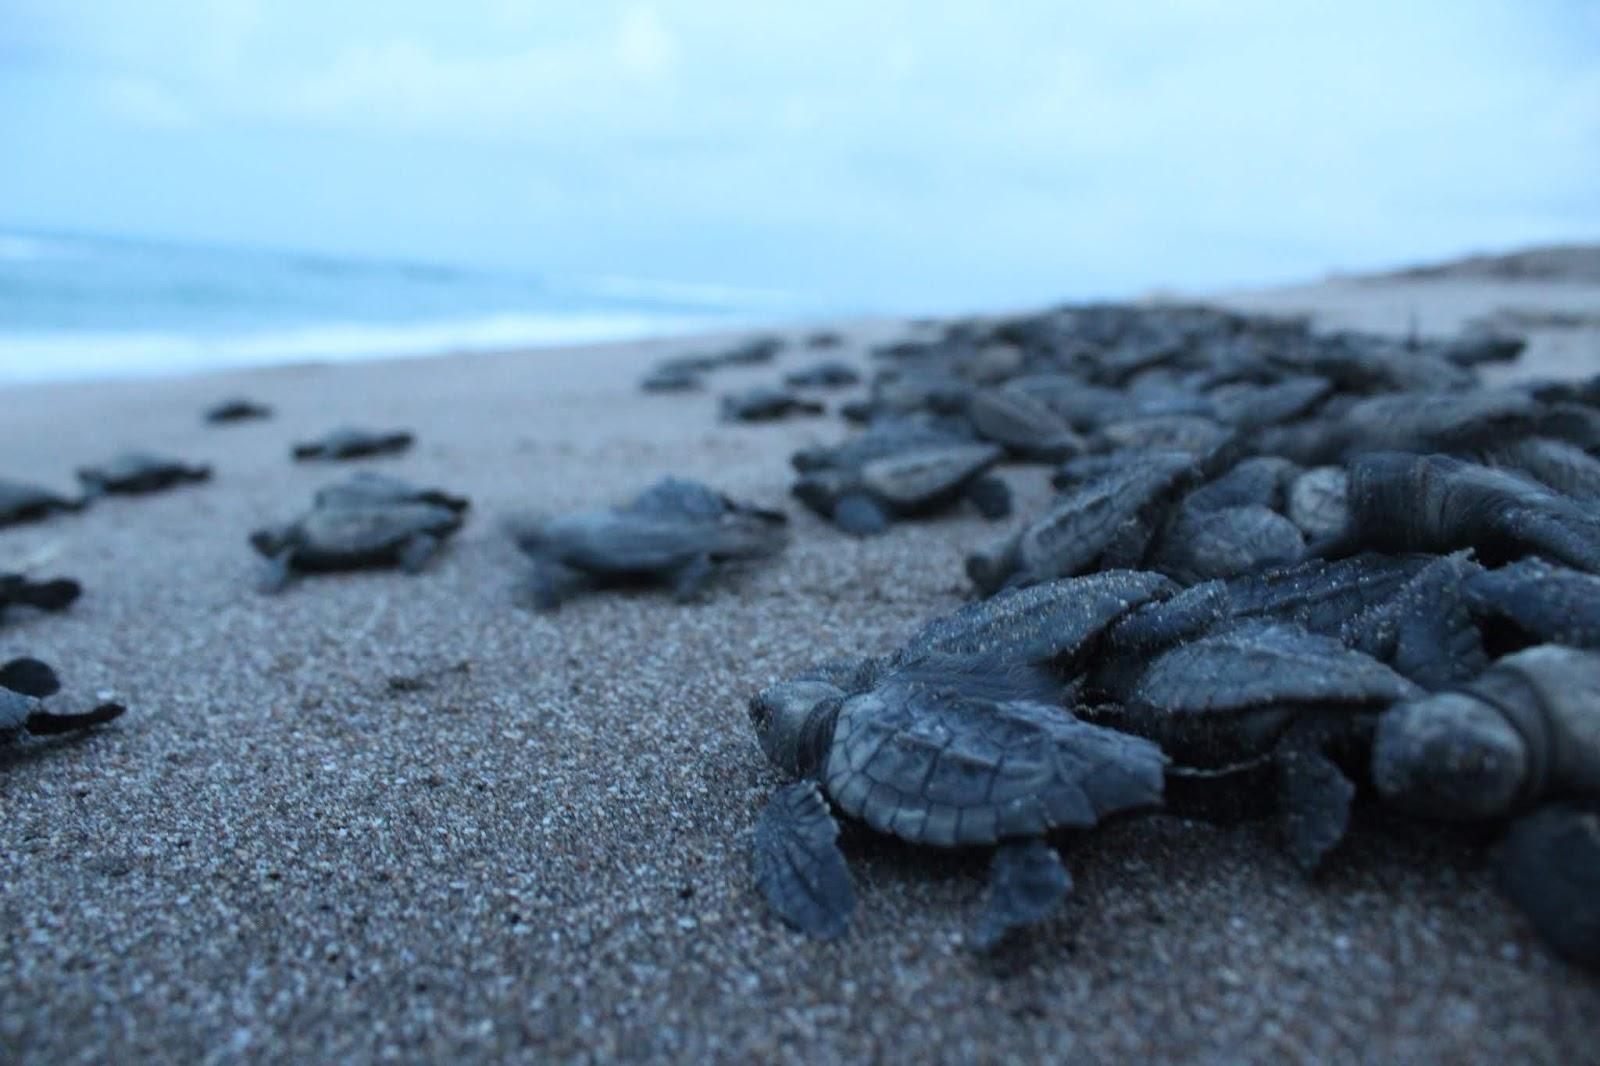 tortugas dirigiendose al mar